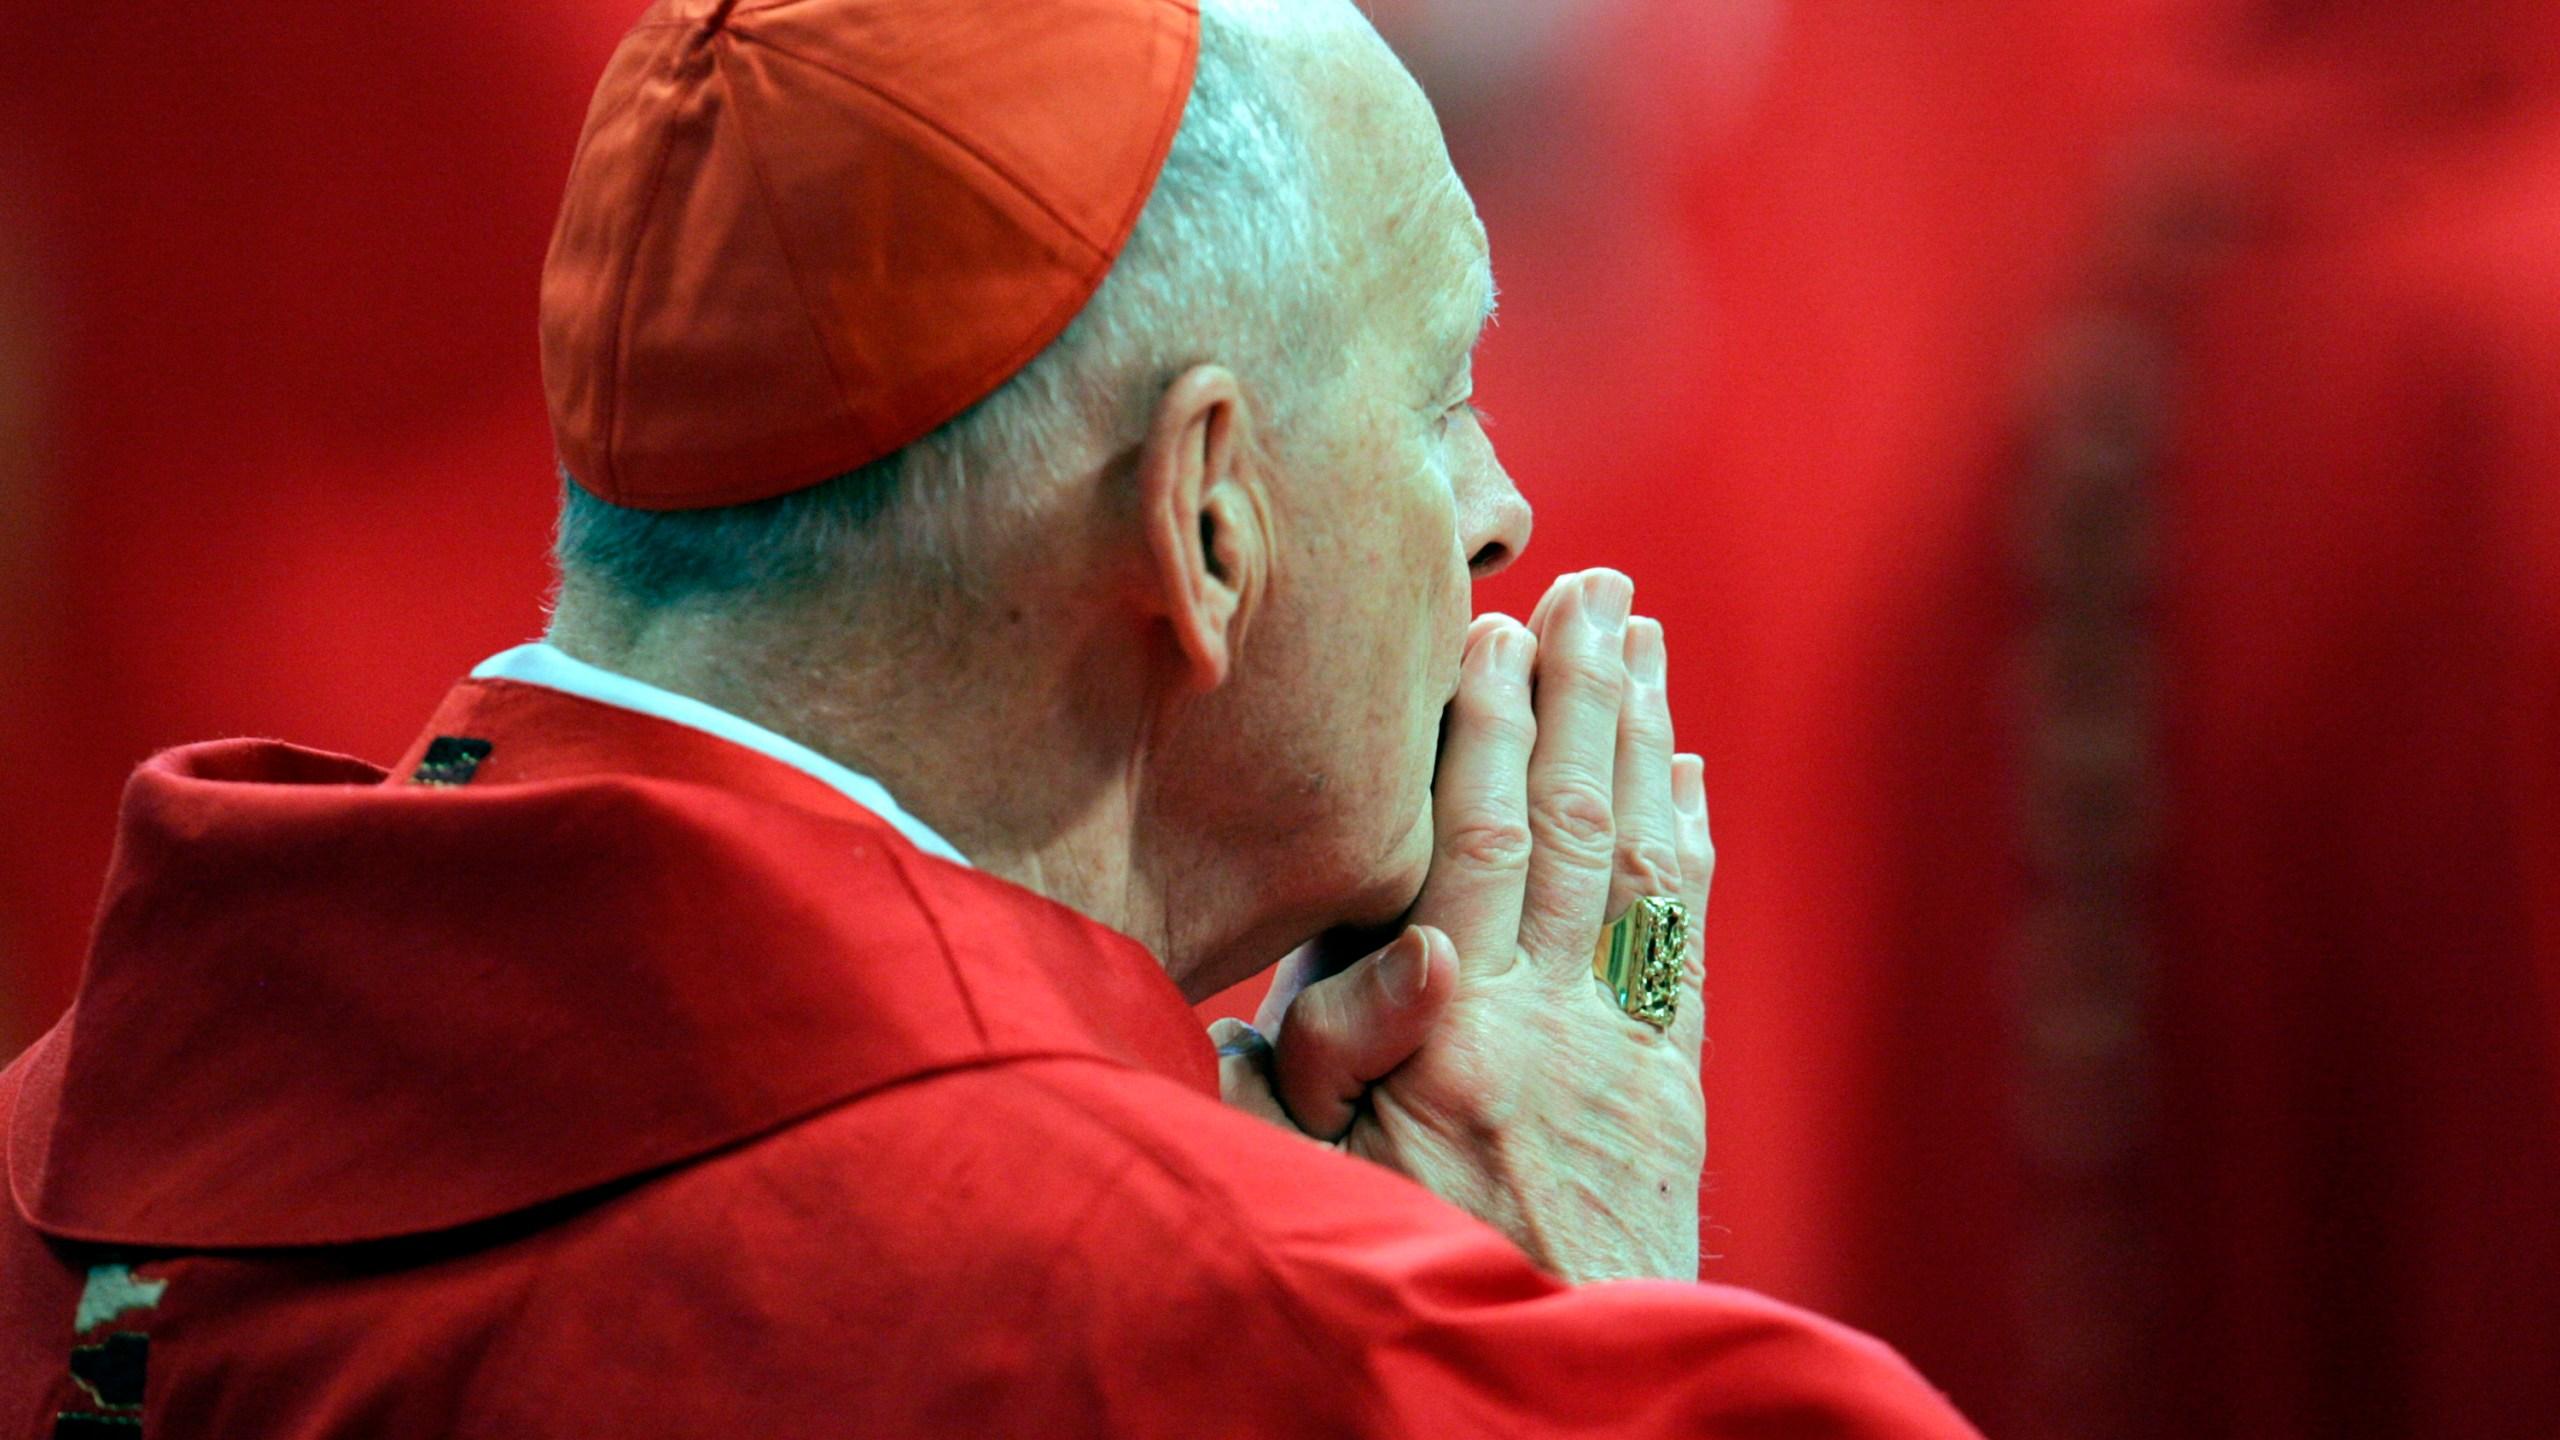 Vatican_US_Church_Abuse_77349-159532.jpg32642140